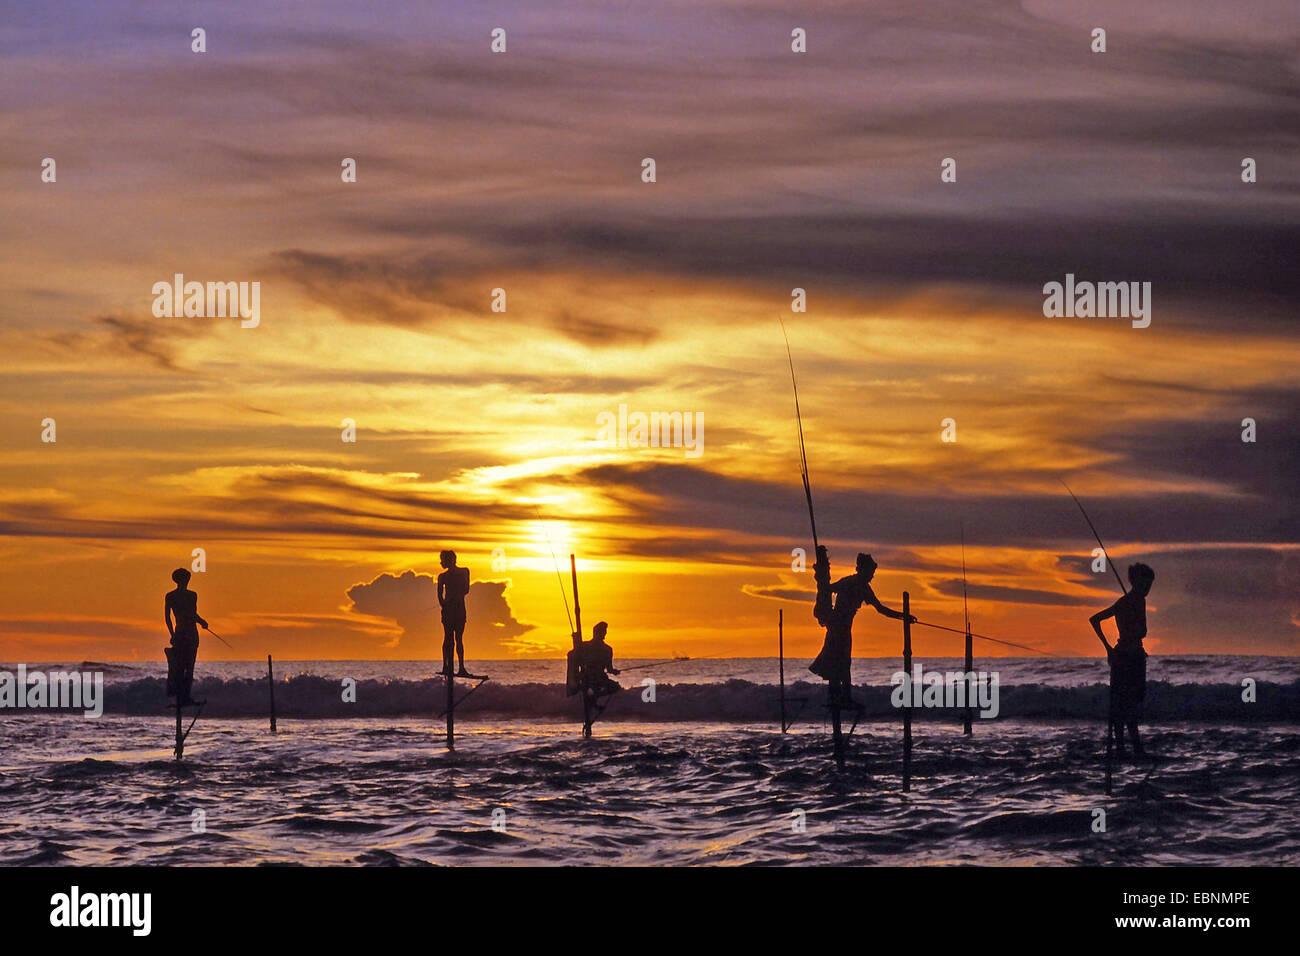 stilt fishermen at Sri Lanka, Sri Lanka - Stock Image